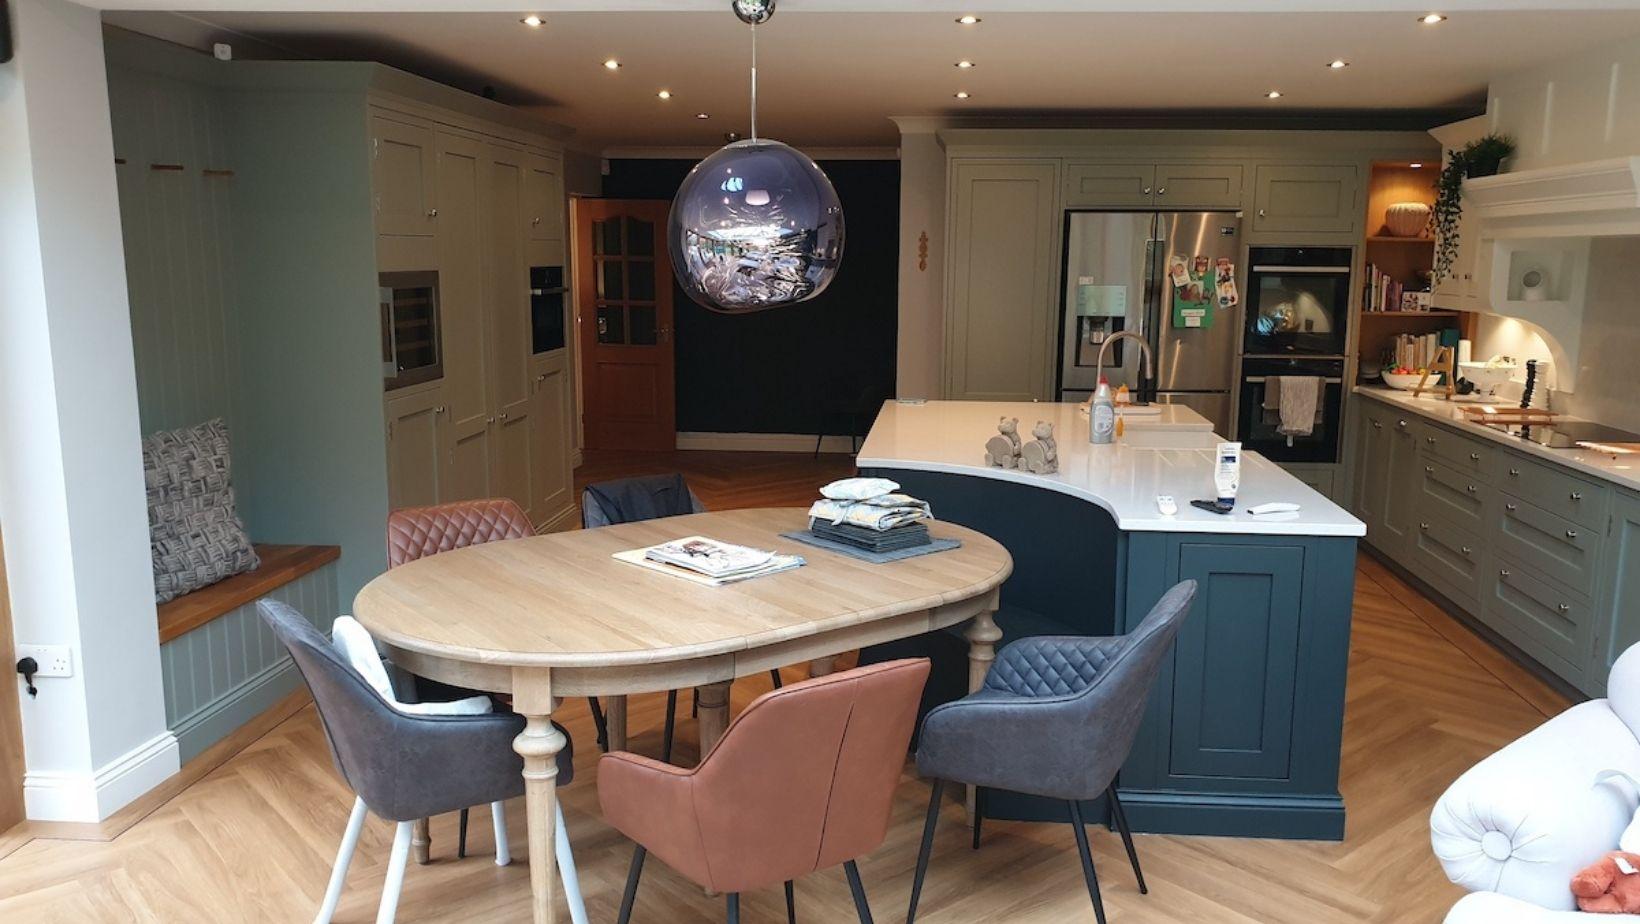 shaker, wood panelled wall customer kitchen